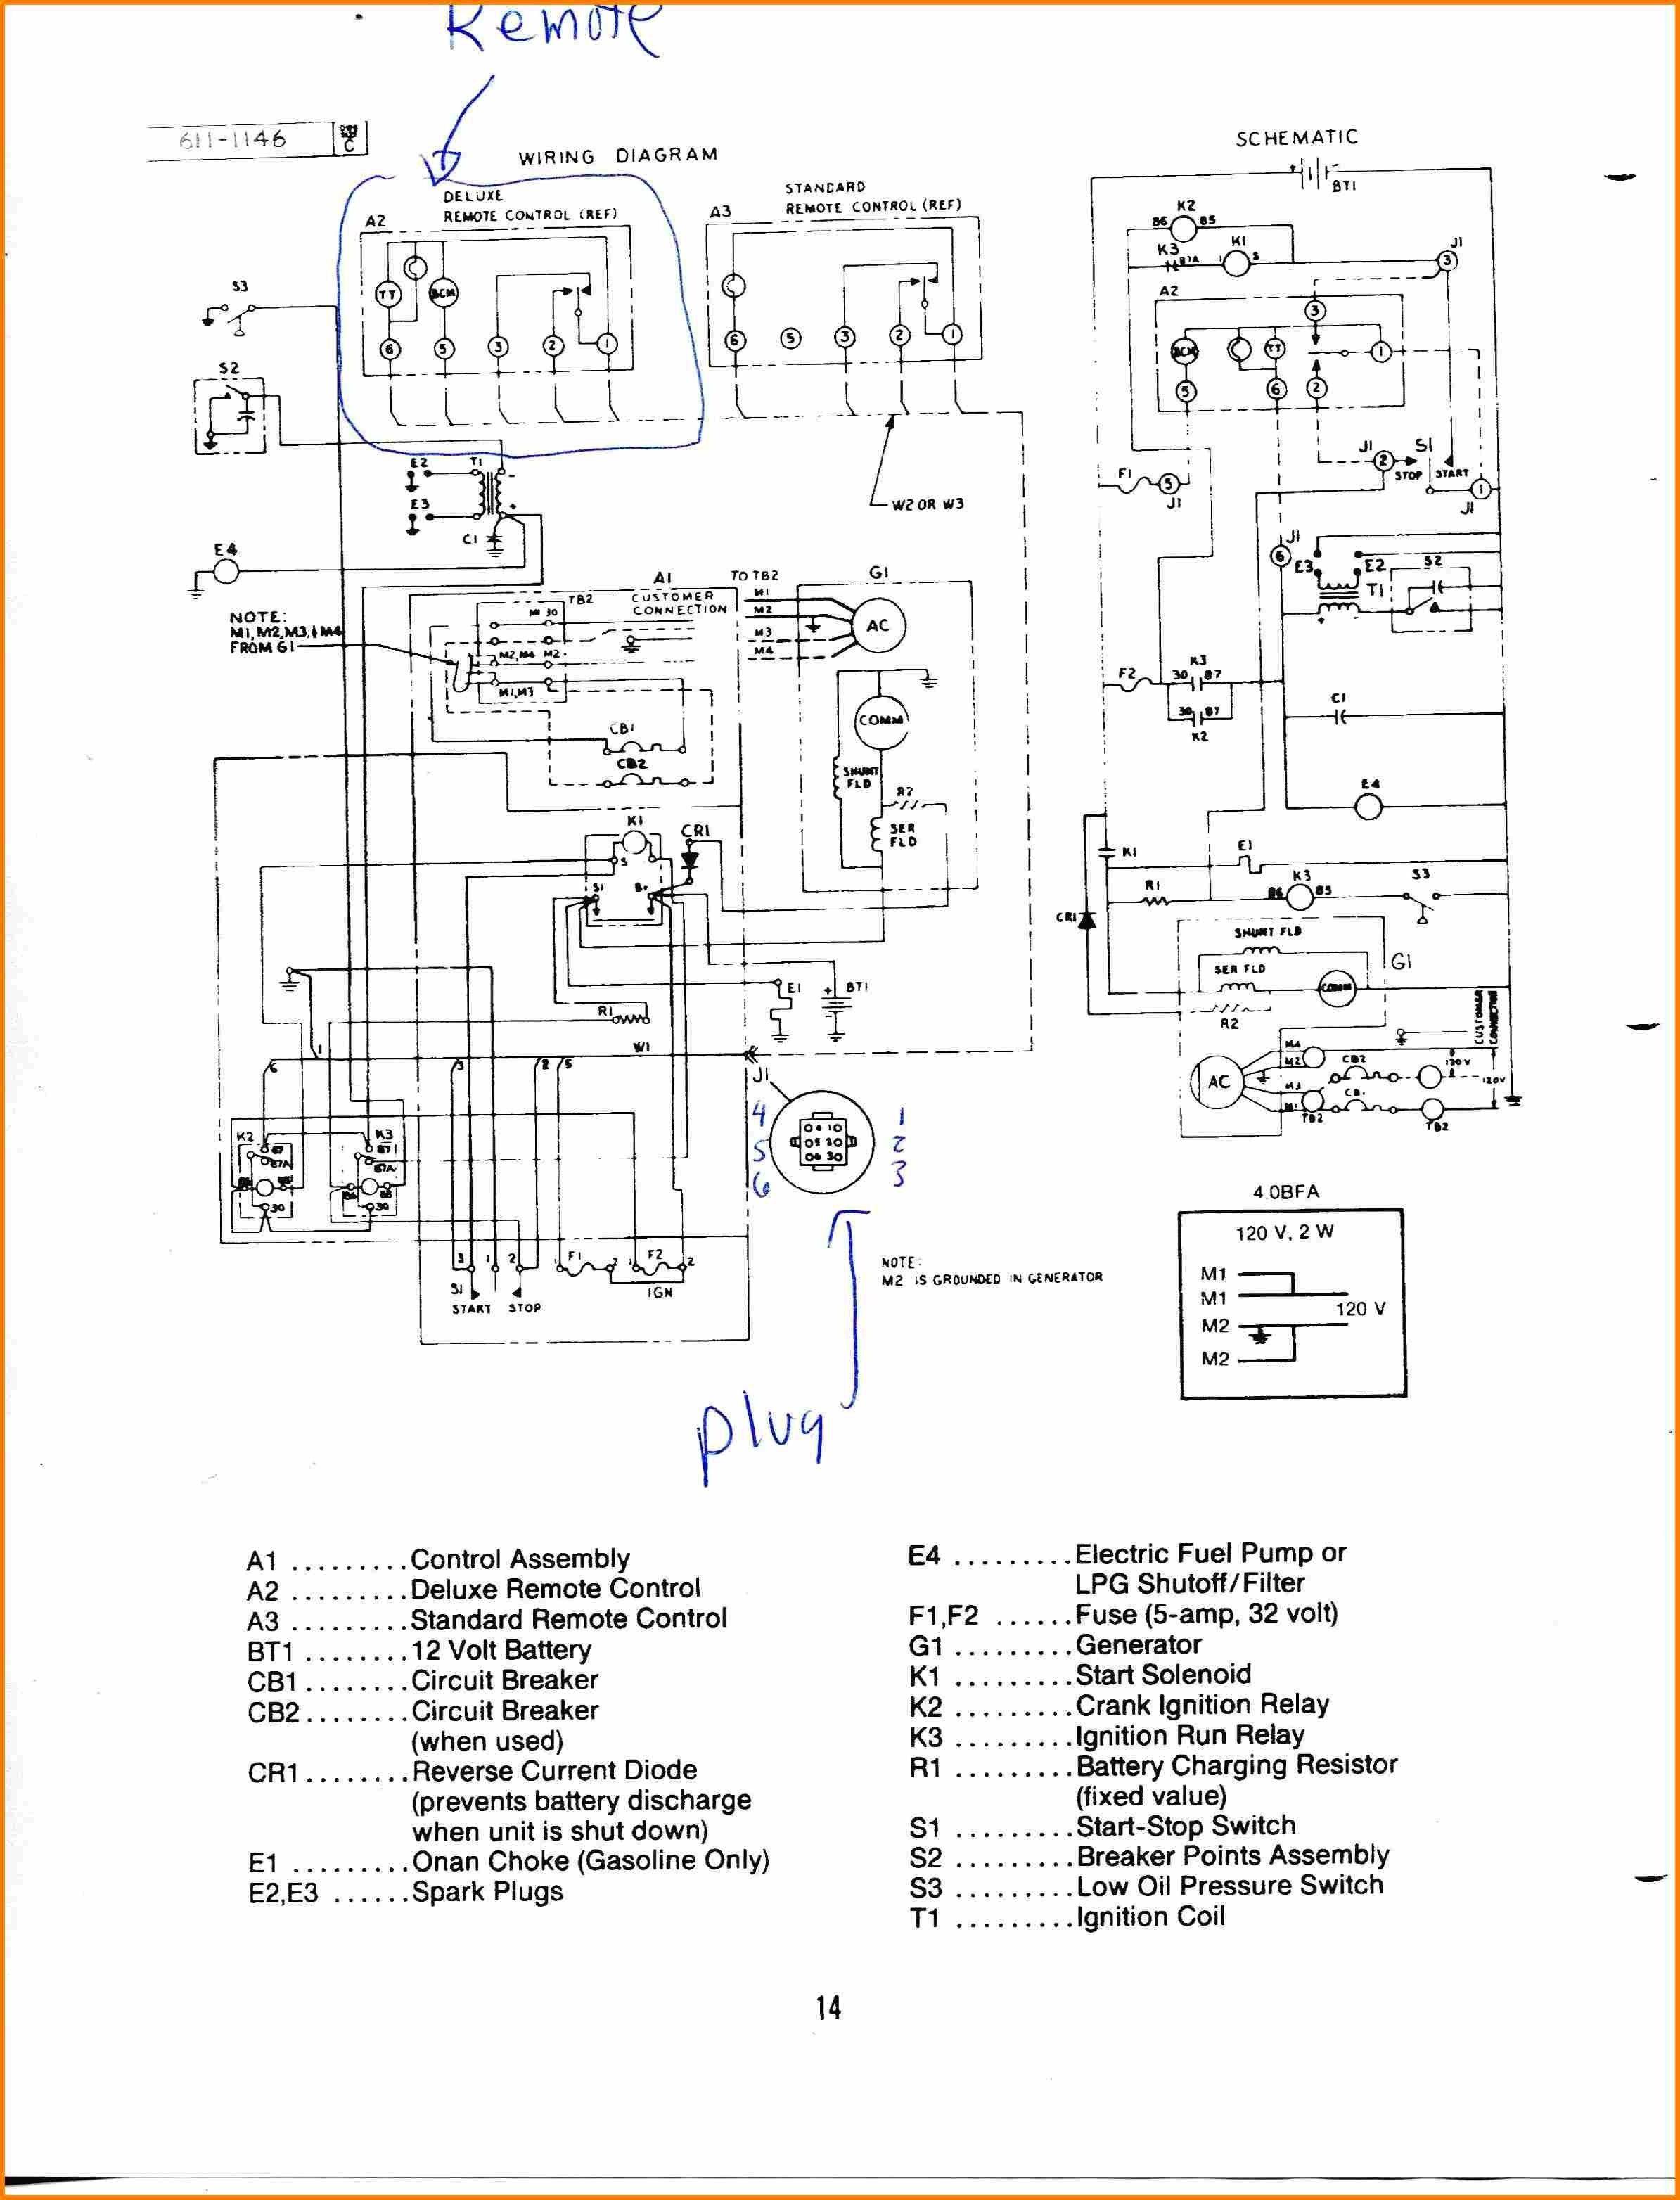 Elegant Rv Generator Wiring Diagram In 2020 Diagram Diagram Chart Generation